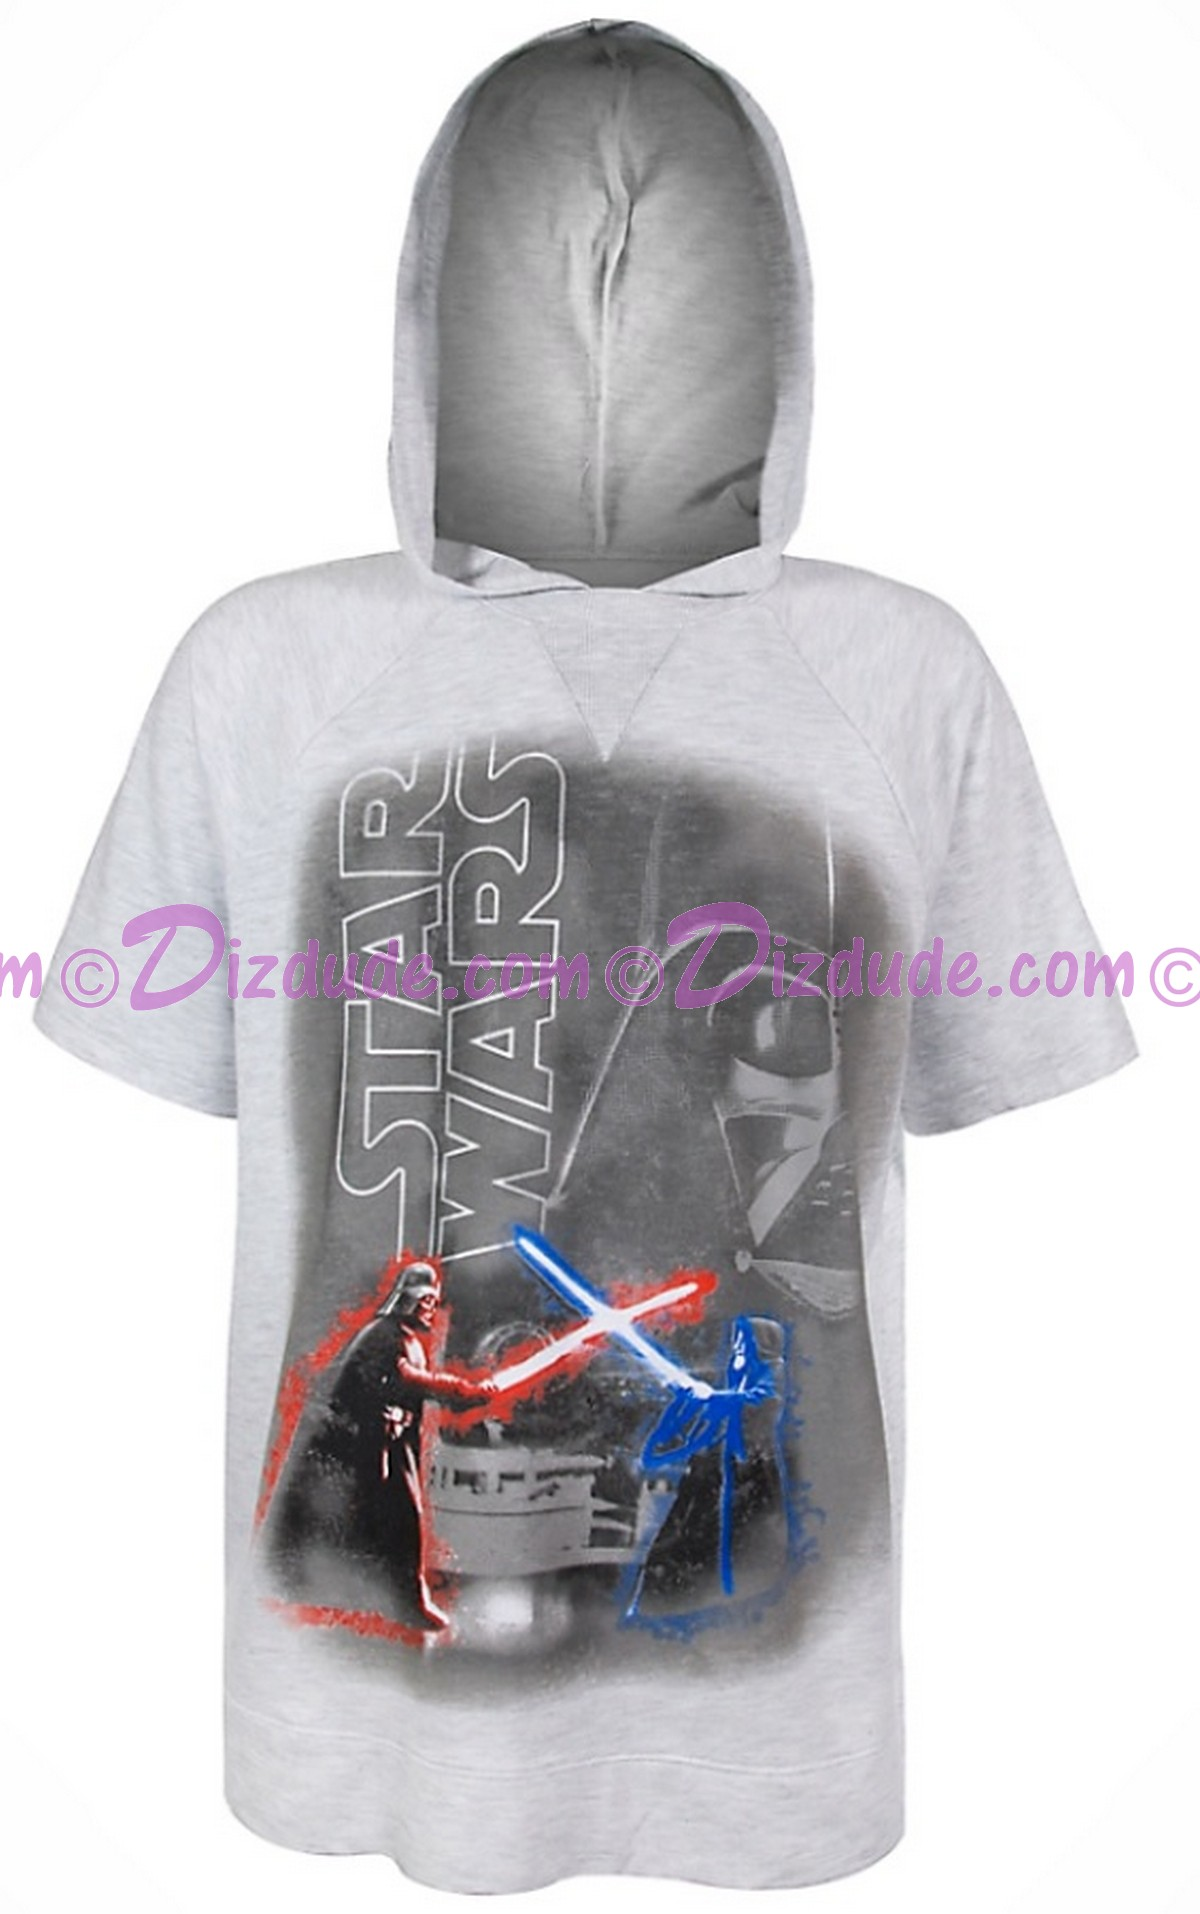 Disney Star Wars Darth Vader Adult Hooded T-Shirt (Tshirt, T shirt or Tee) © Dizdude.com